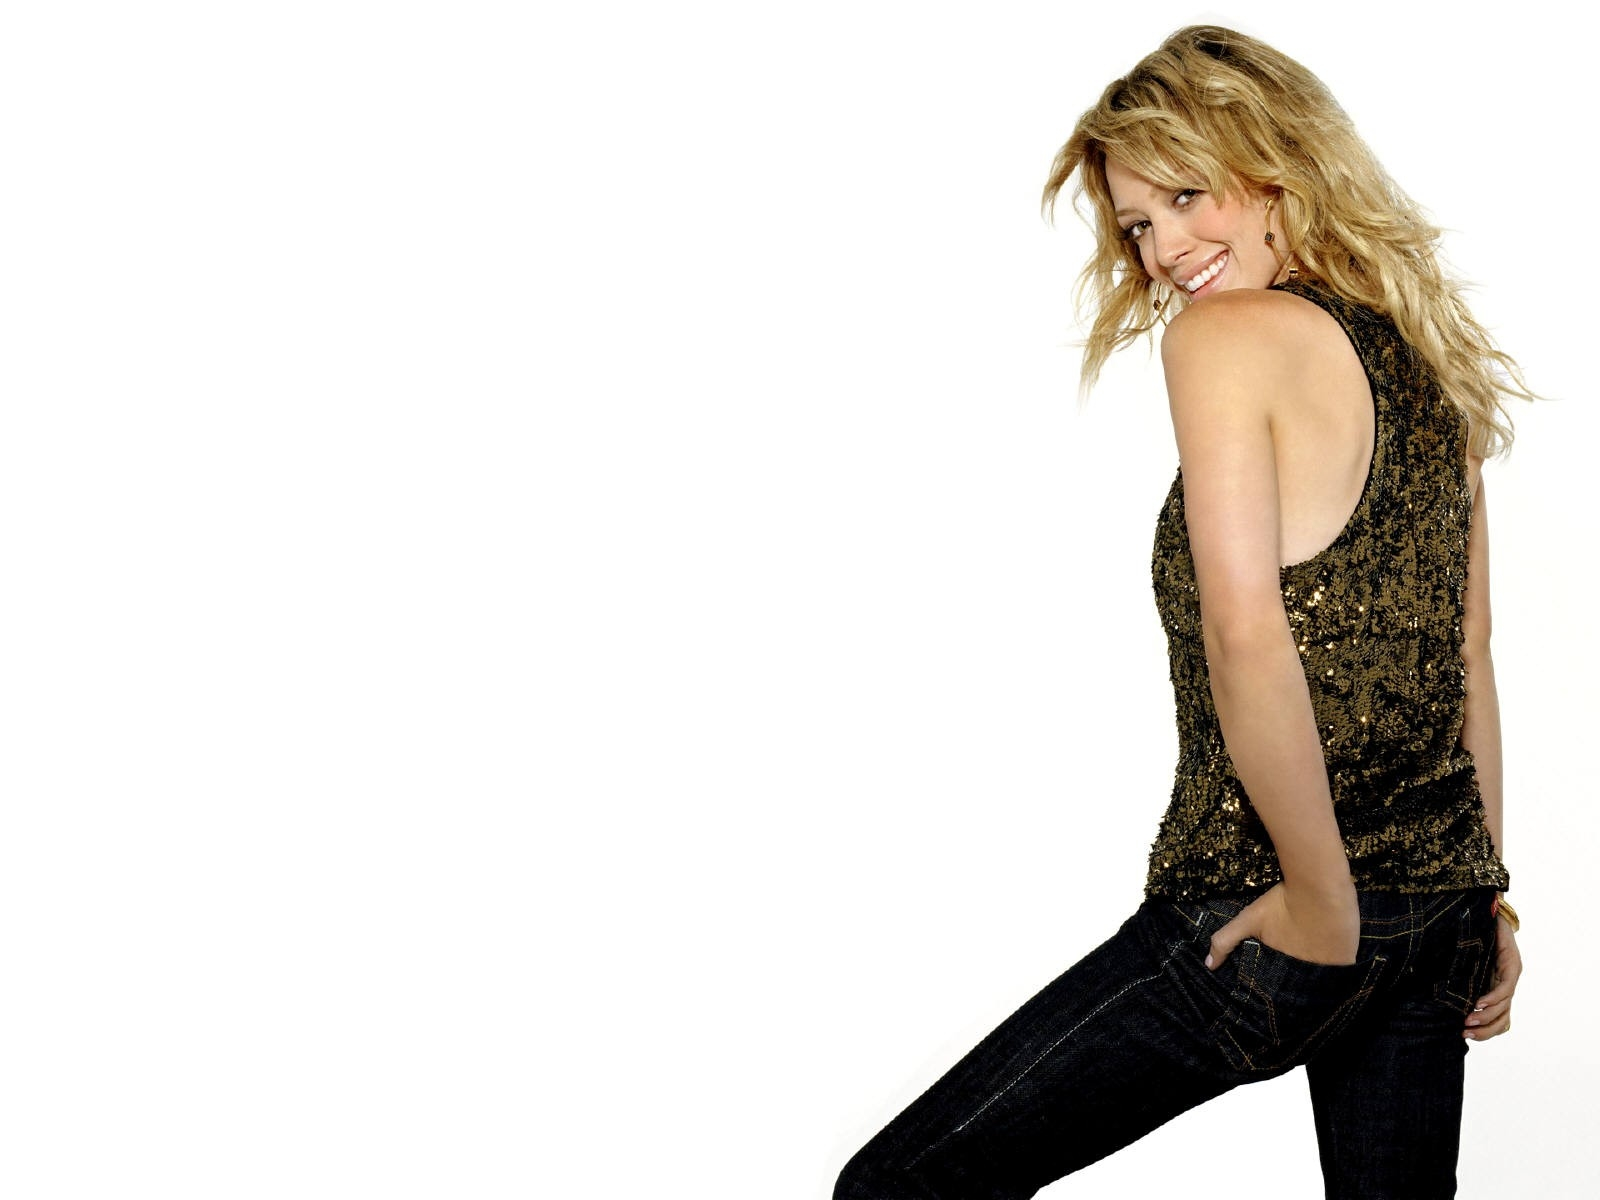 Wallpaper di Hilary Duff - 2